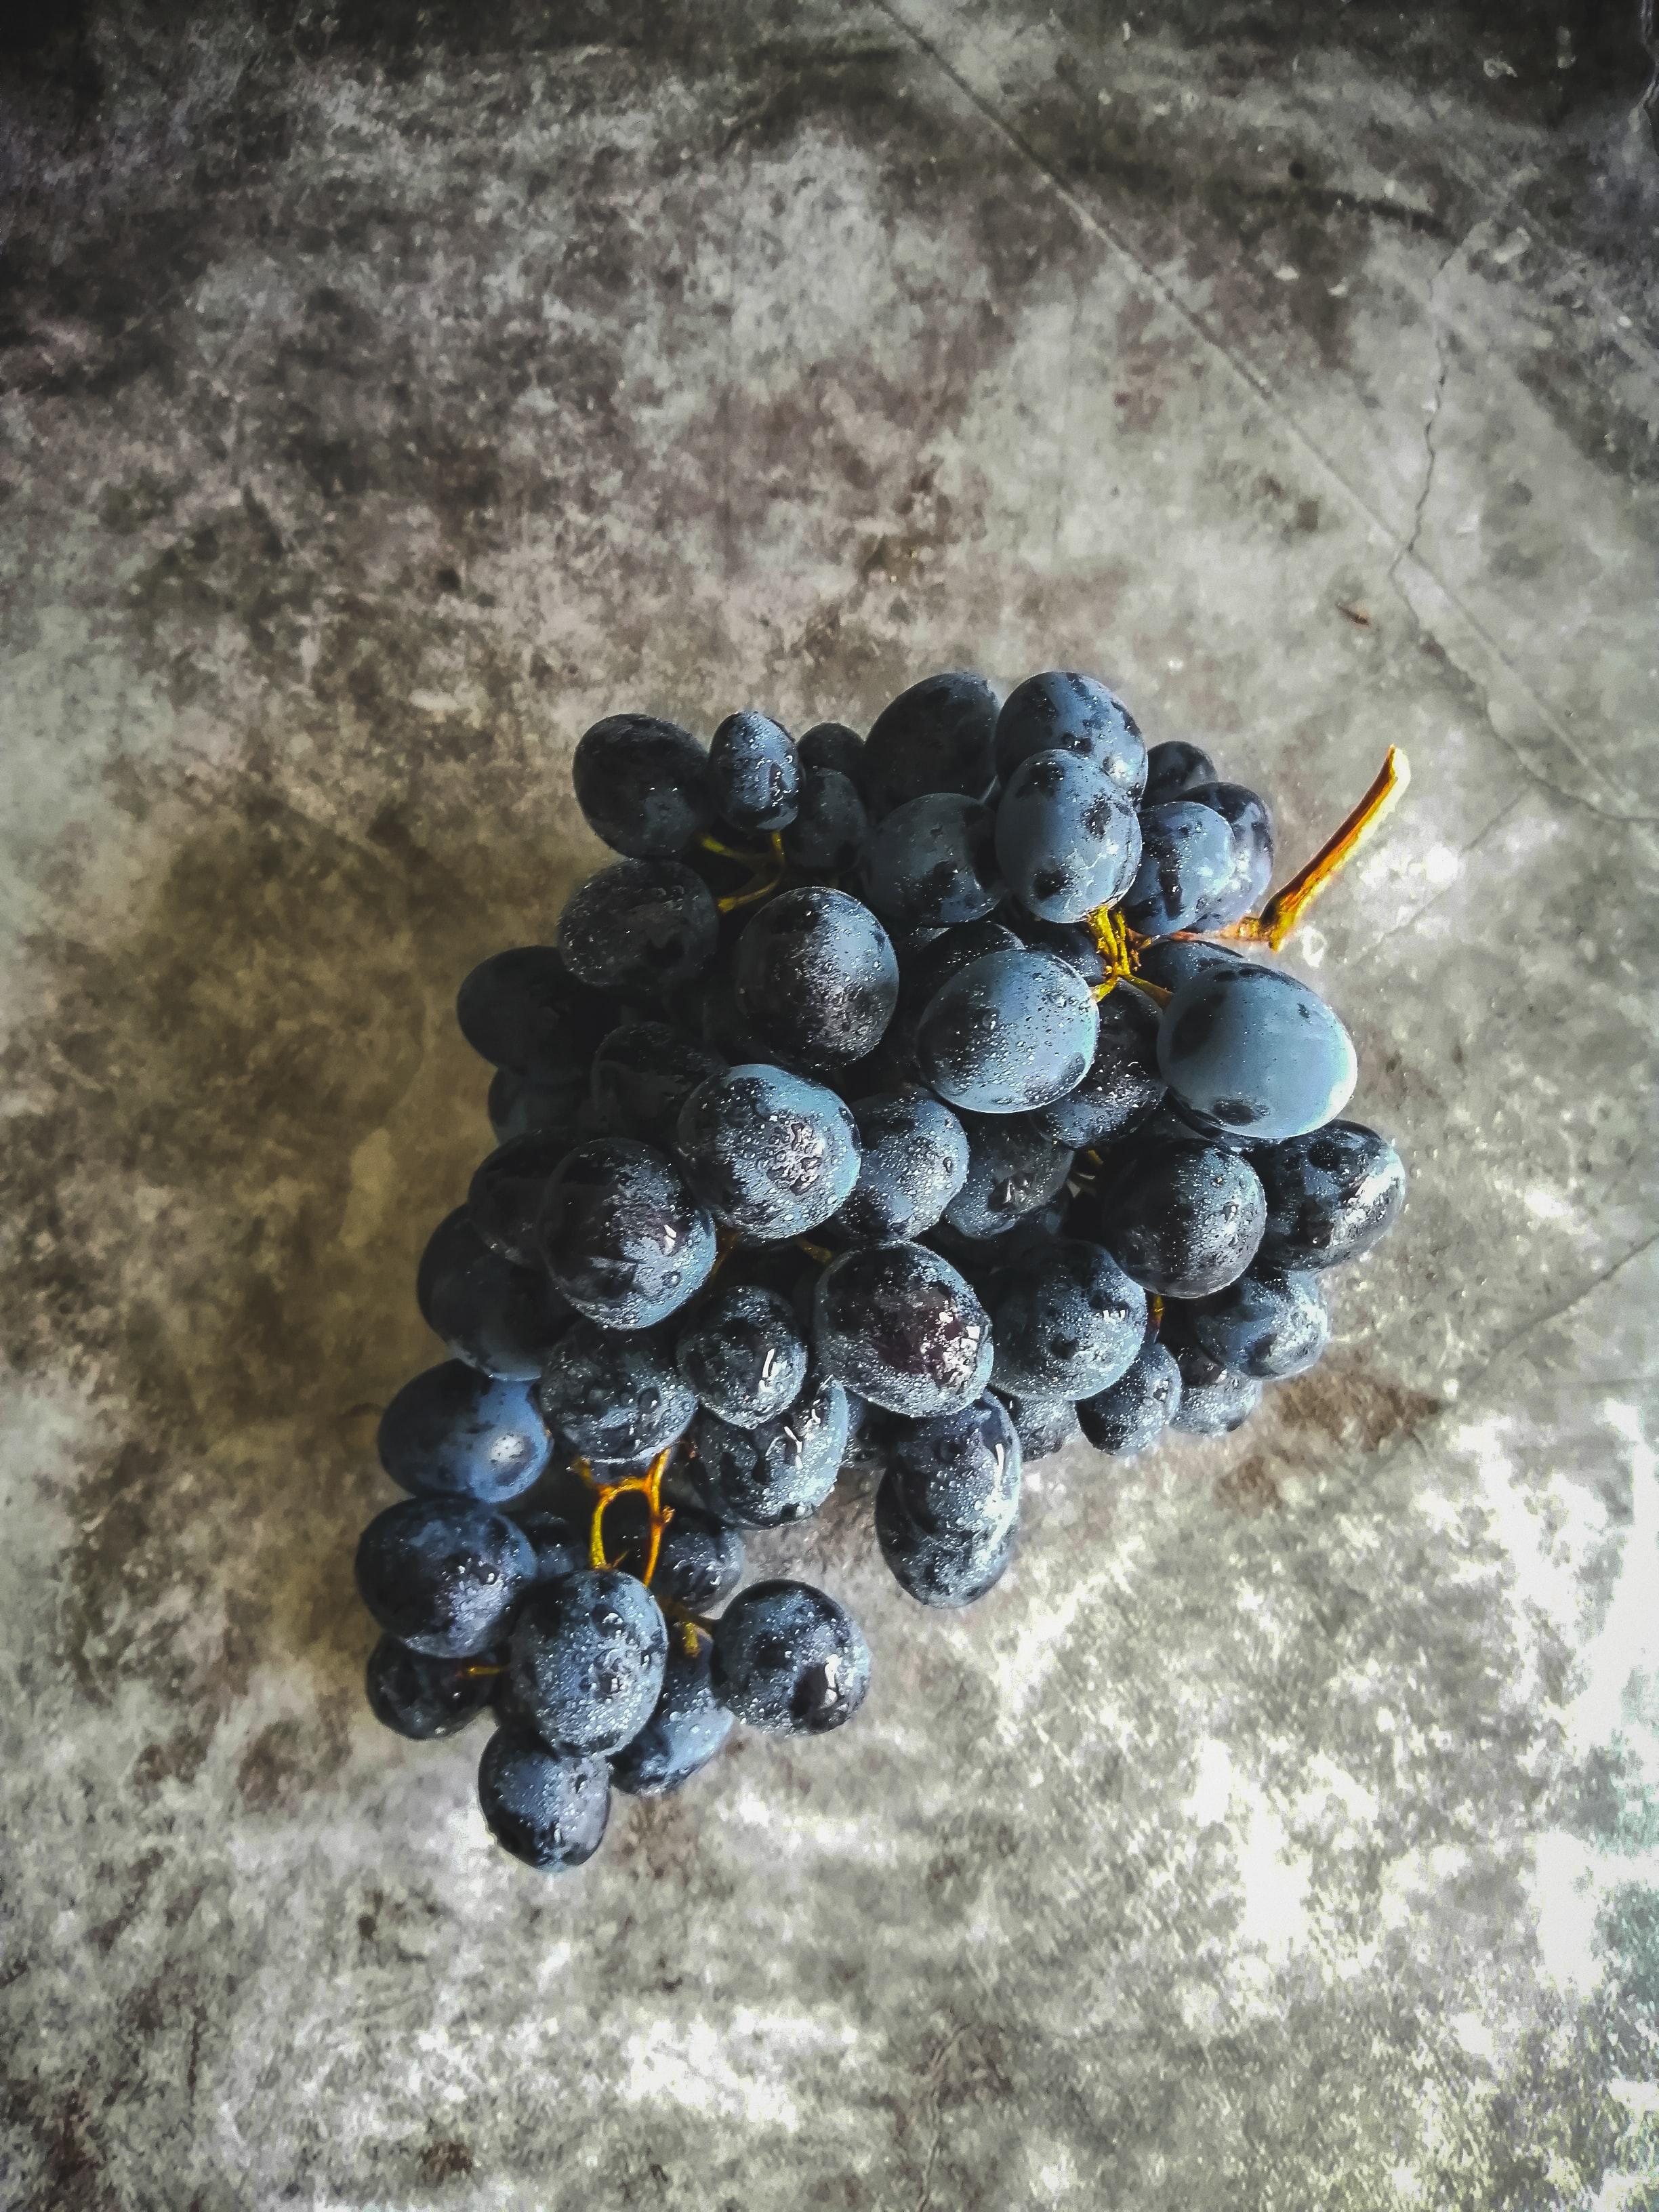 Grapes/tijana-drndarski-2HVmYCkrJfs-unsplash.jpg